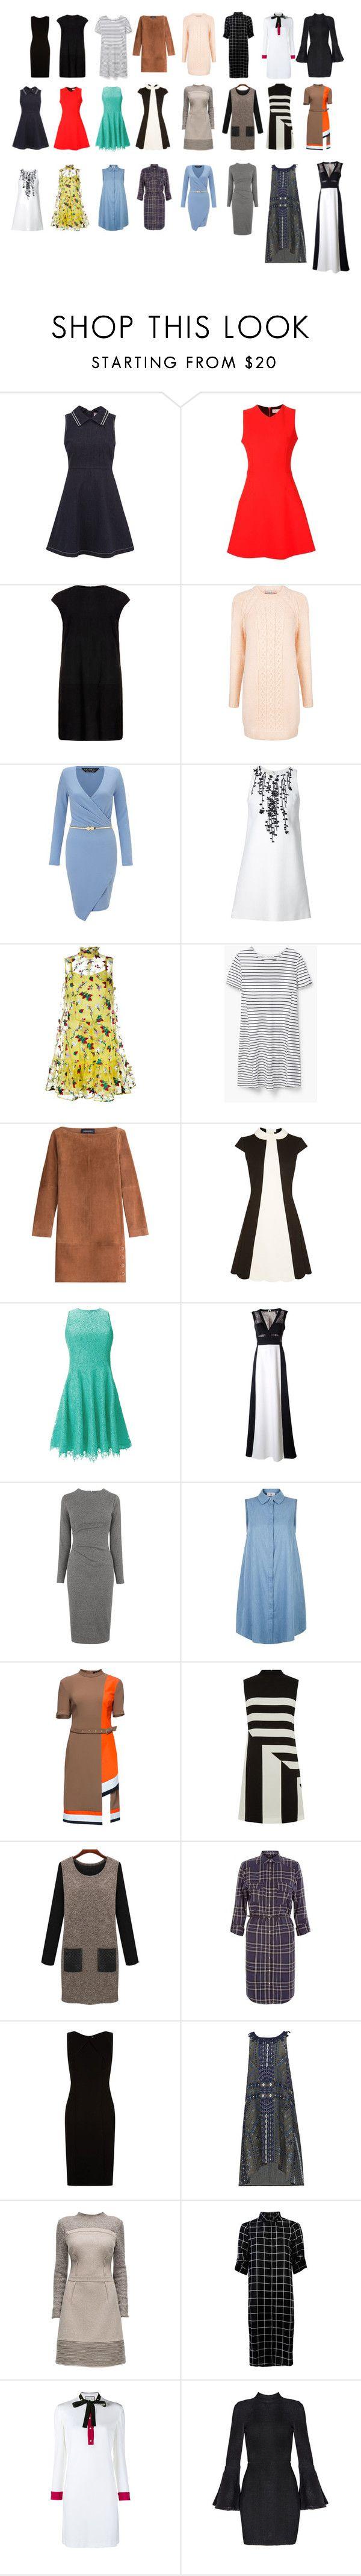 Rectangle Body Shape - Dresses by pennyrdunning on Polyvore featuring Erdem, Victoria Beckham, Vanessa Seward, Gucci, BCBGMAXAZRIA, Sea, New York, BOSS Hugo Boss, Lattori, RED Valentino and MuuBaa